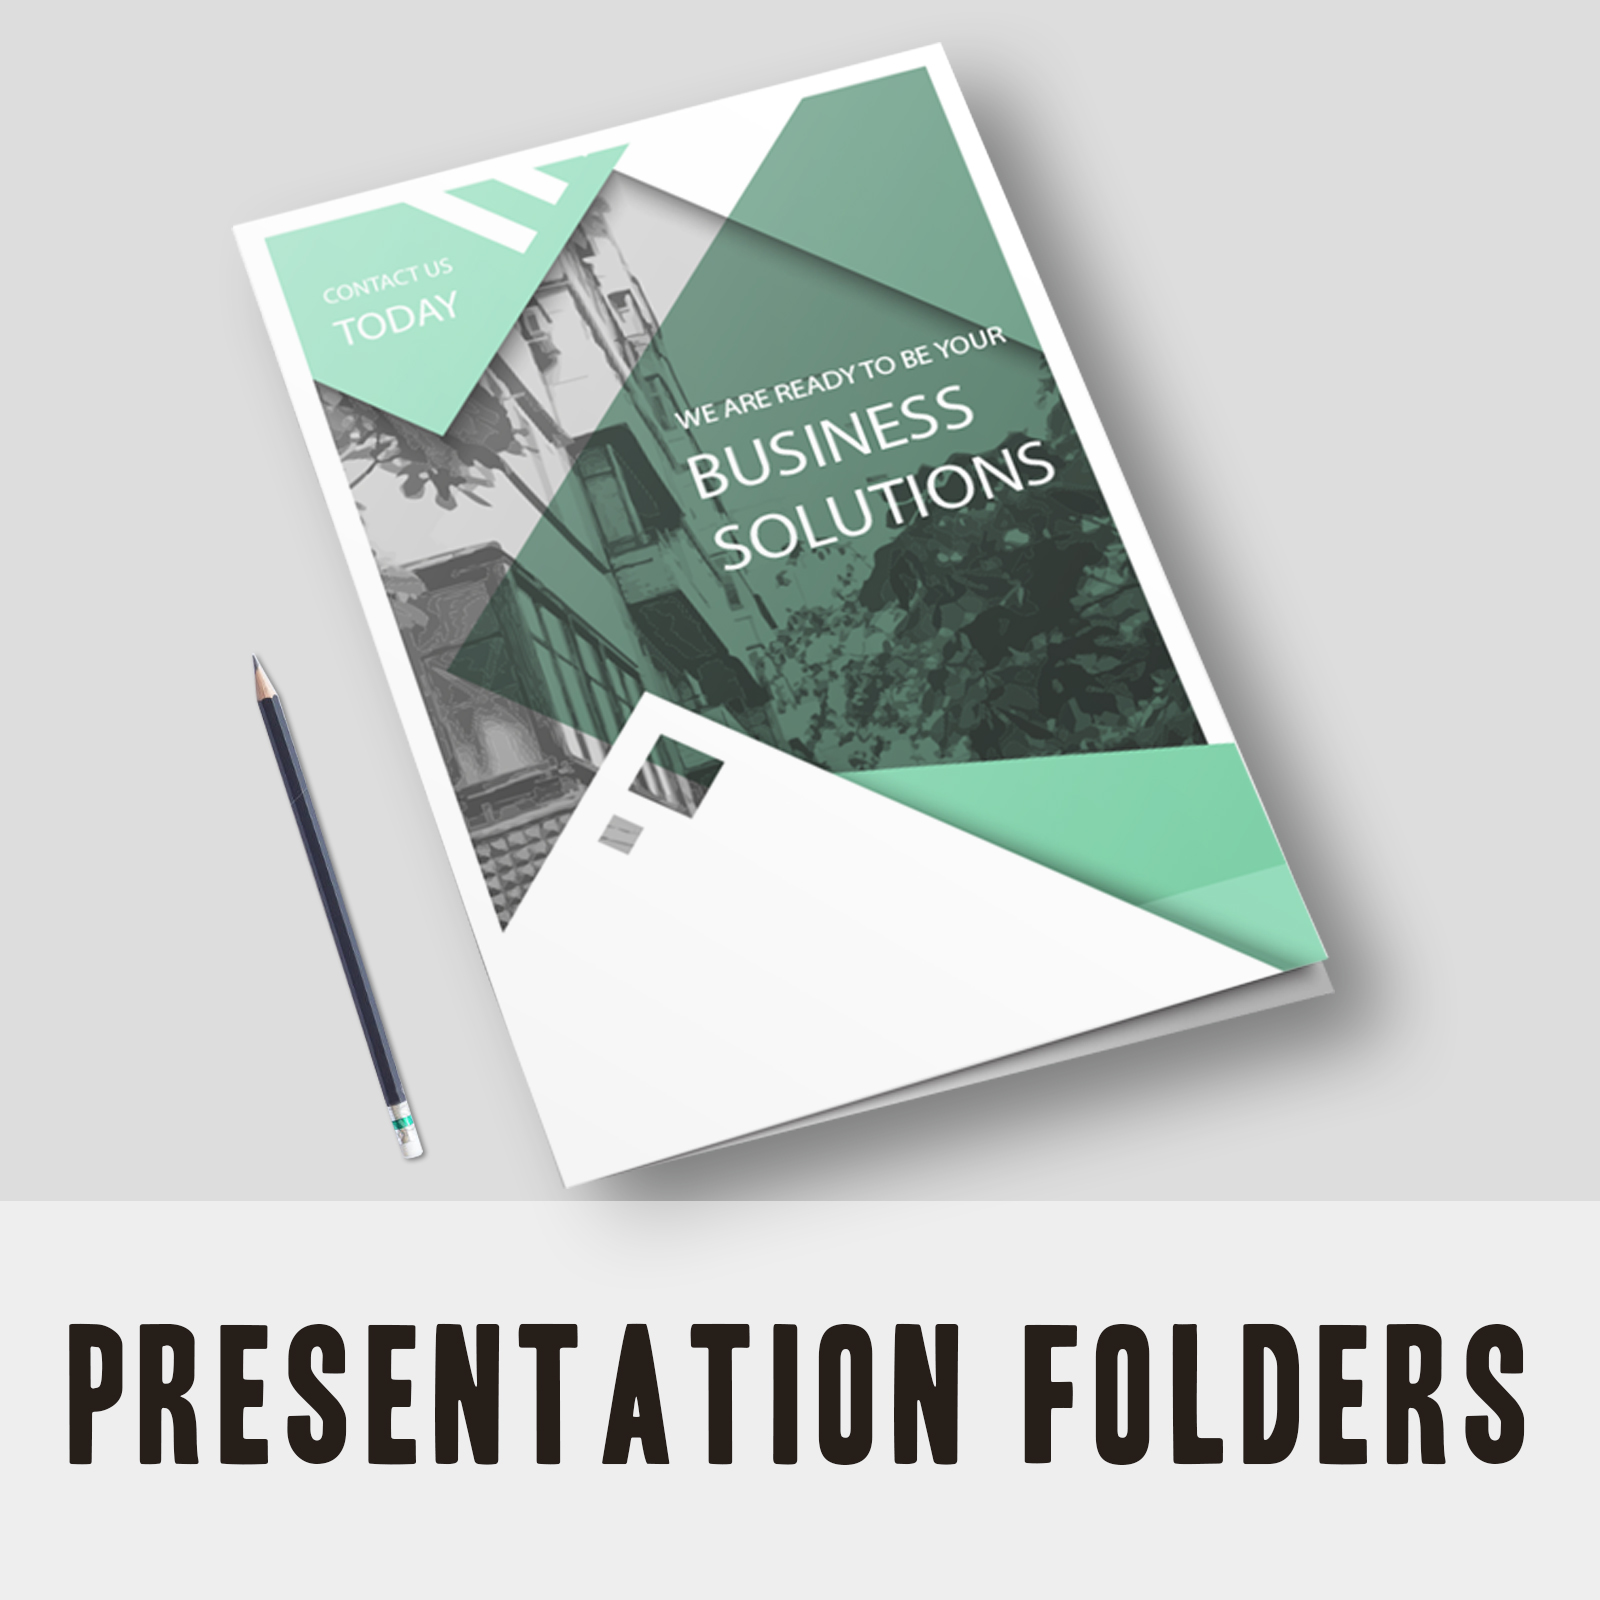 Presentation Folder - Business Solutions